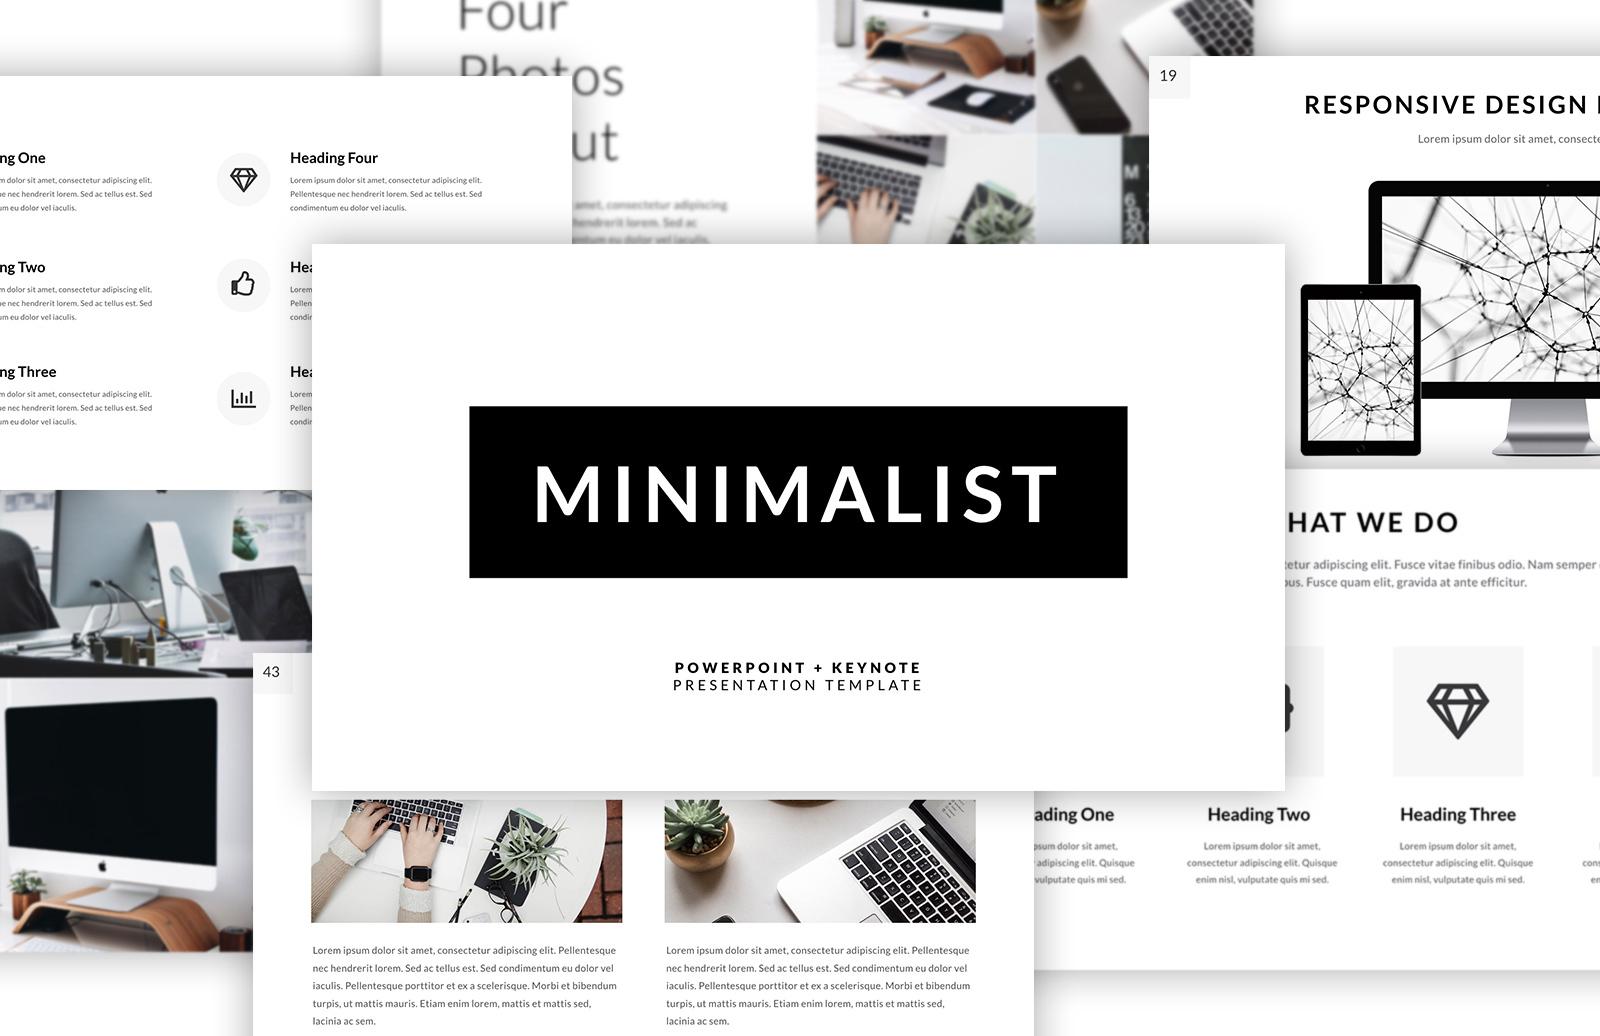 Minimalist Presentation Template Preview 1A